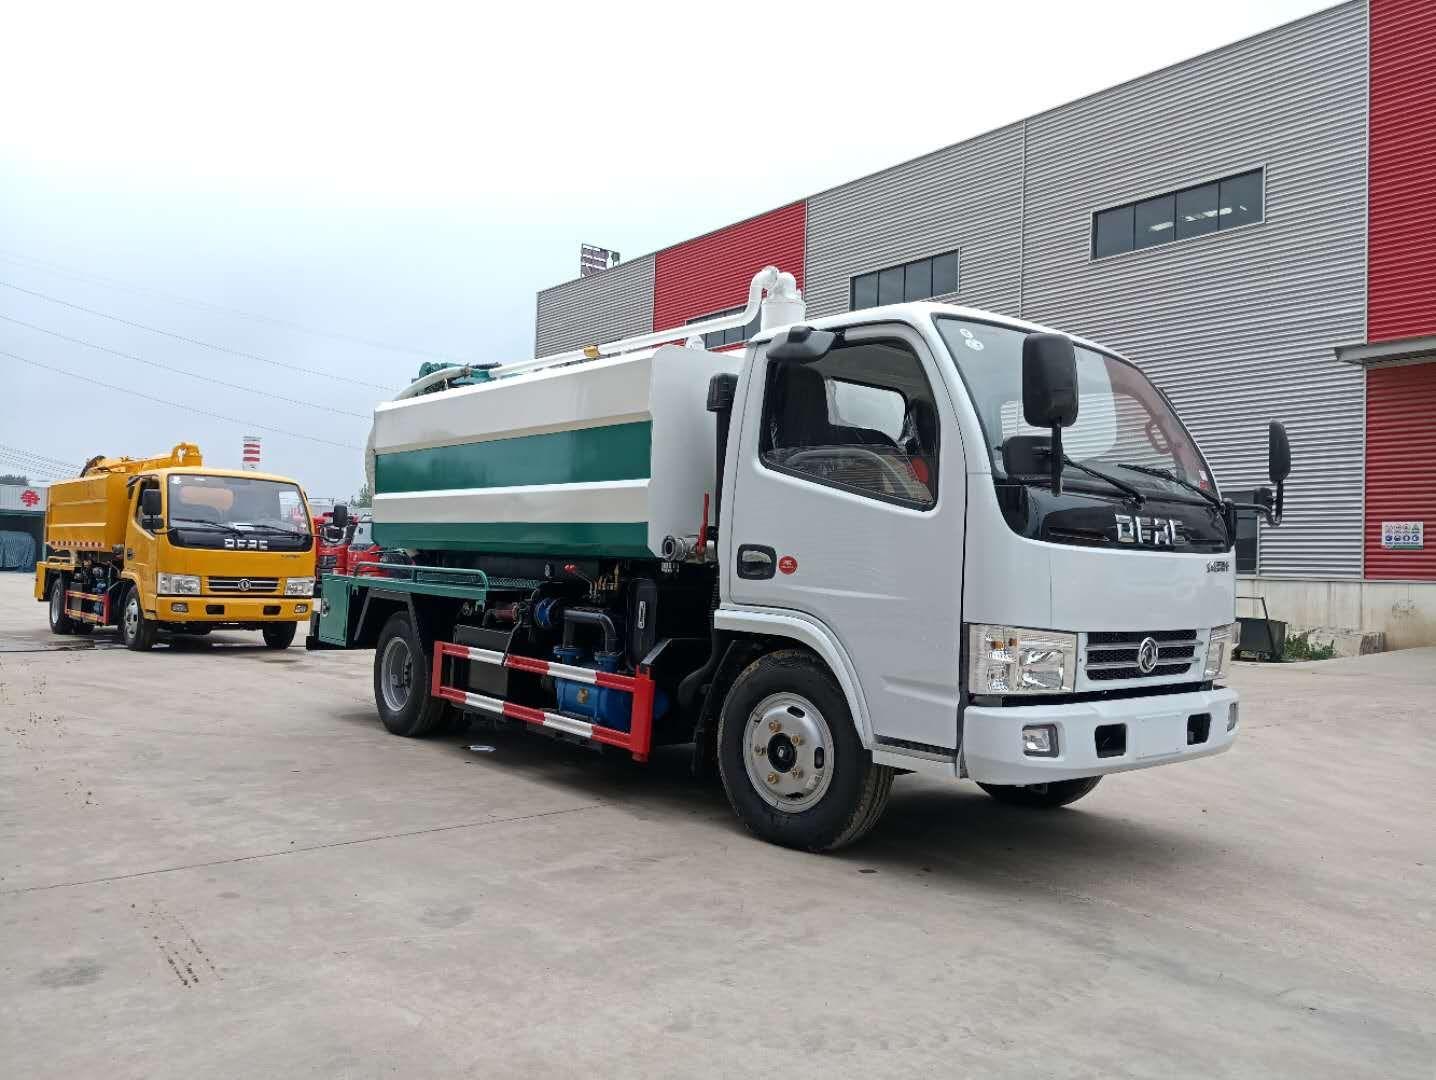 DLK D6 ہوا سکشن صفائی سیوریج ٹرک 2